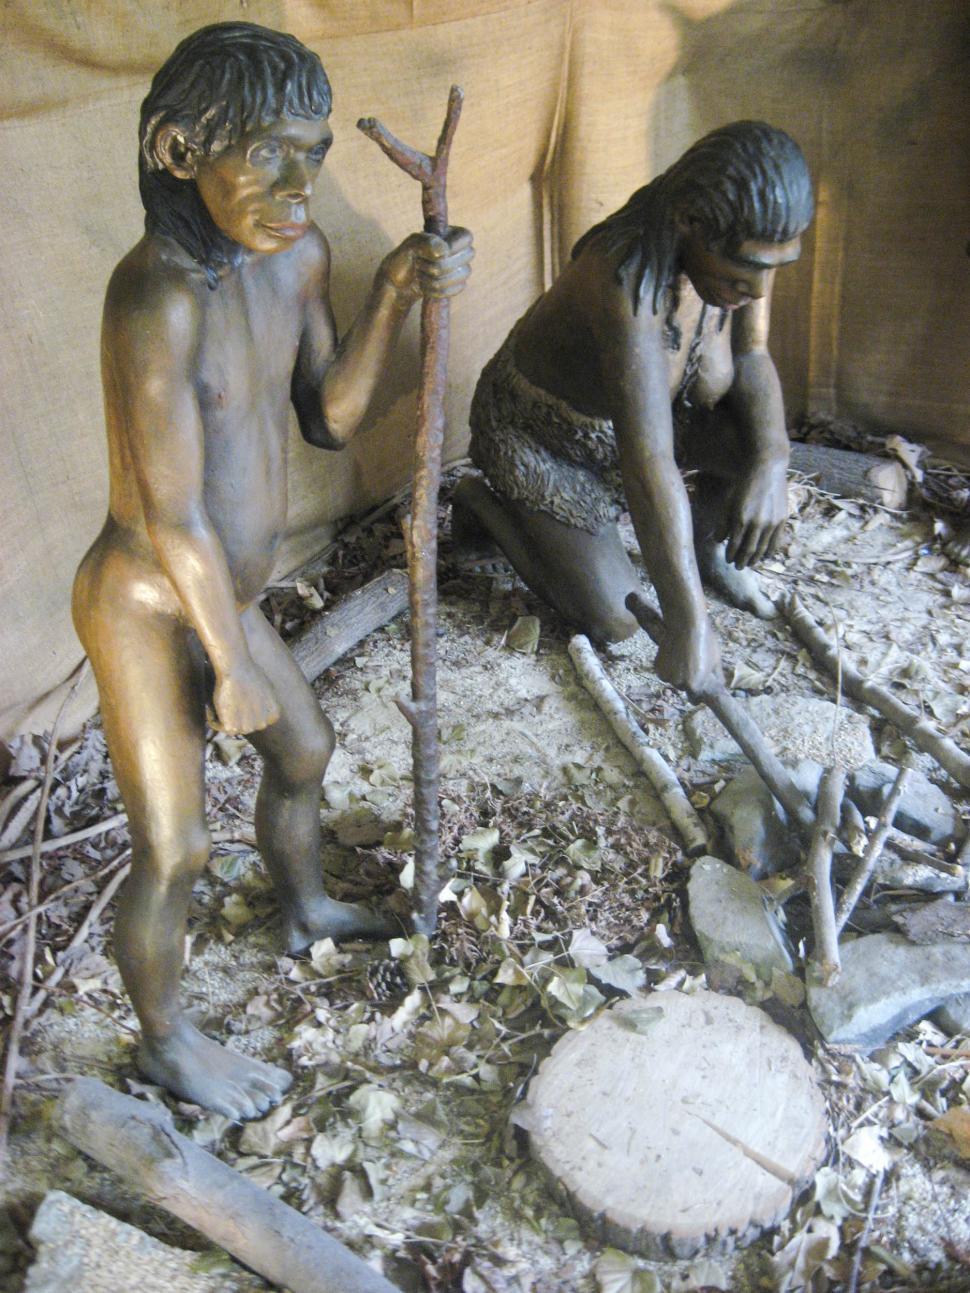 Download Free Stock HD Photo of neandertal man statue Online